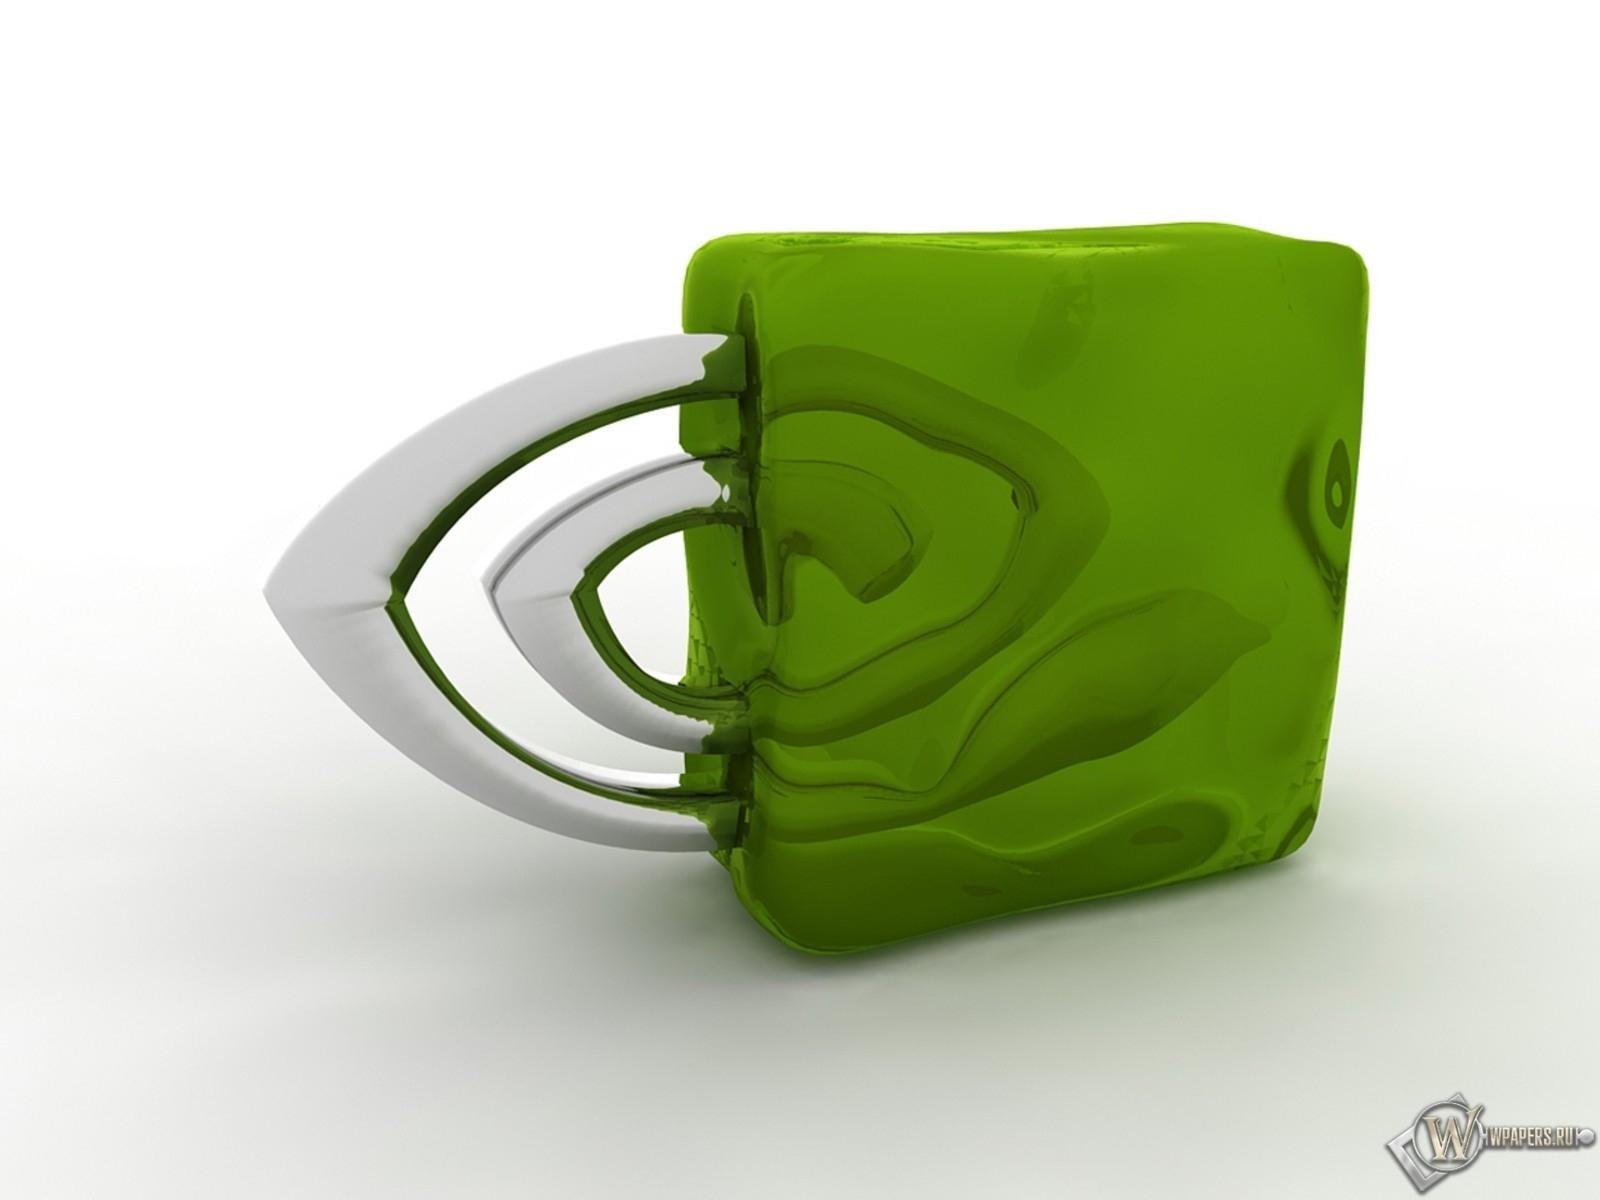 NVidia 3D 1600x1200